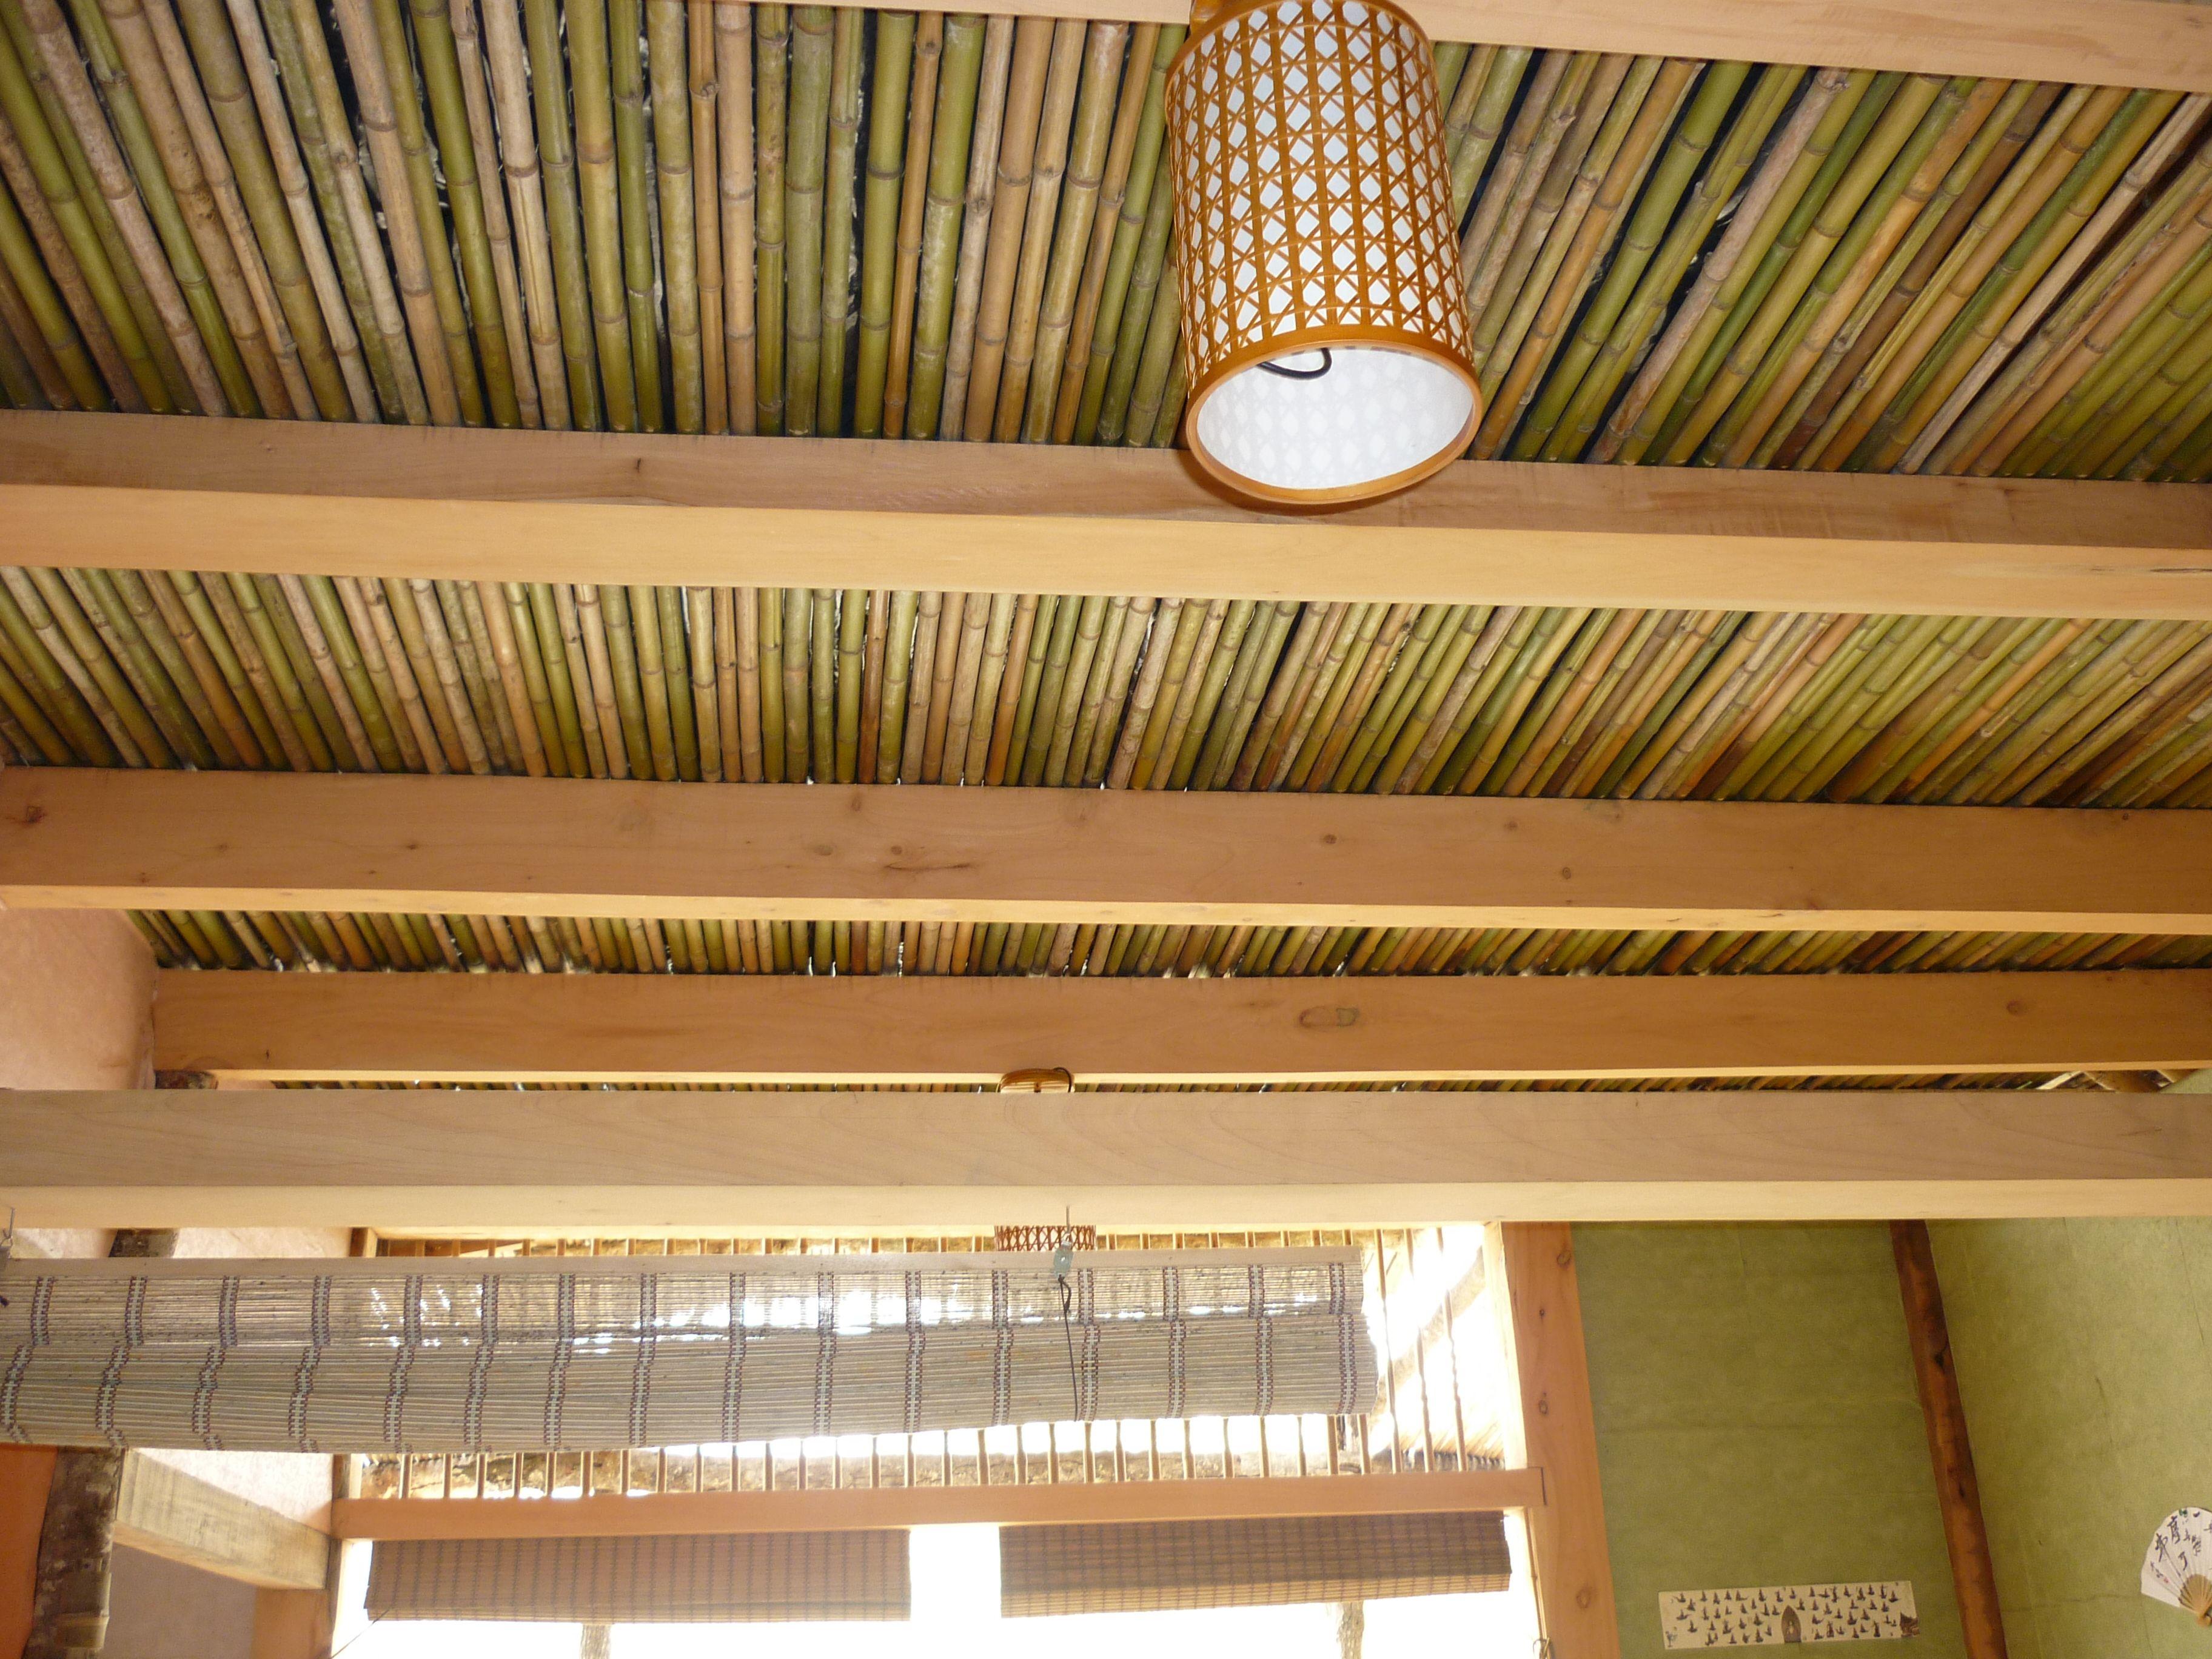 Cielo Razo De Bambu Mi Jardin Ceiling Design Decor Y